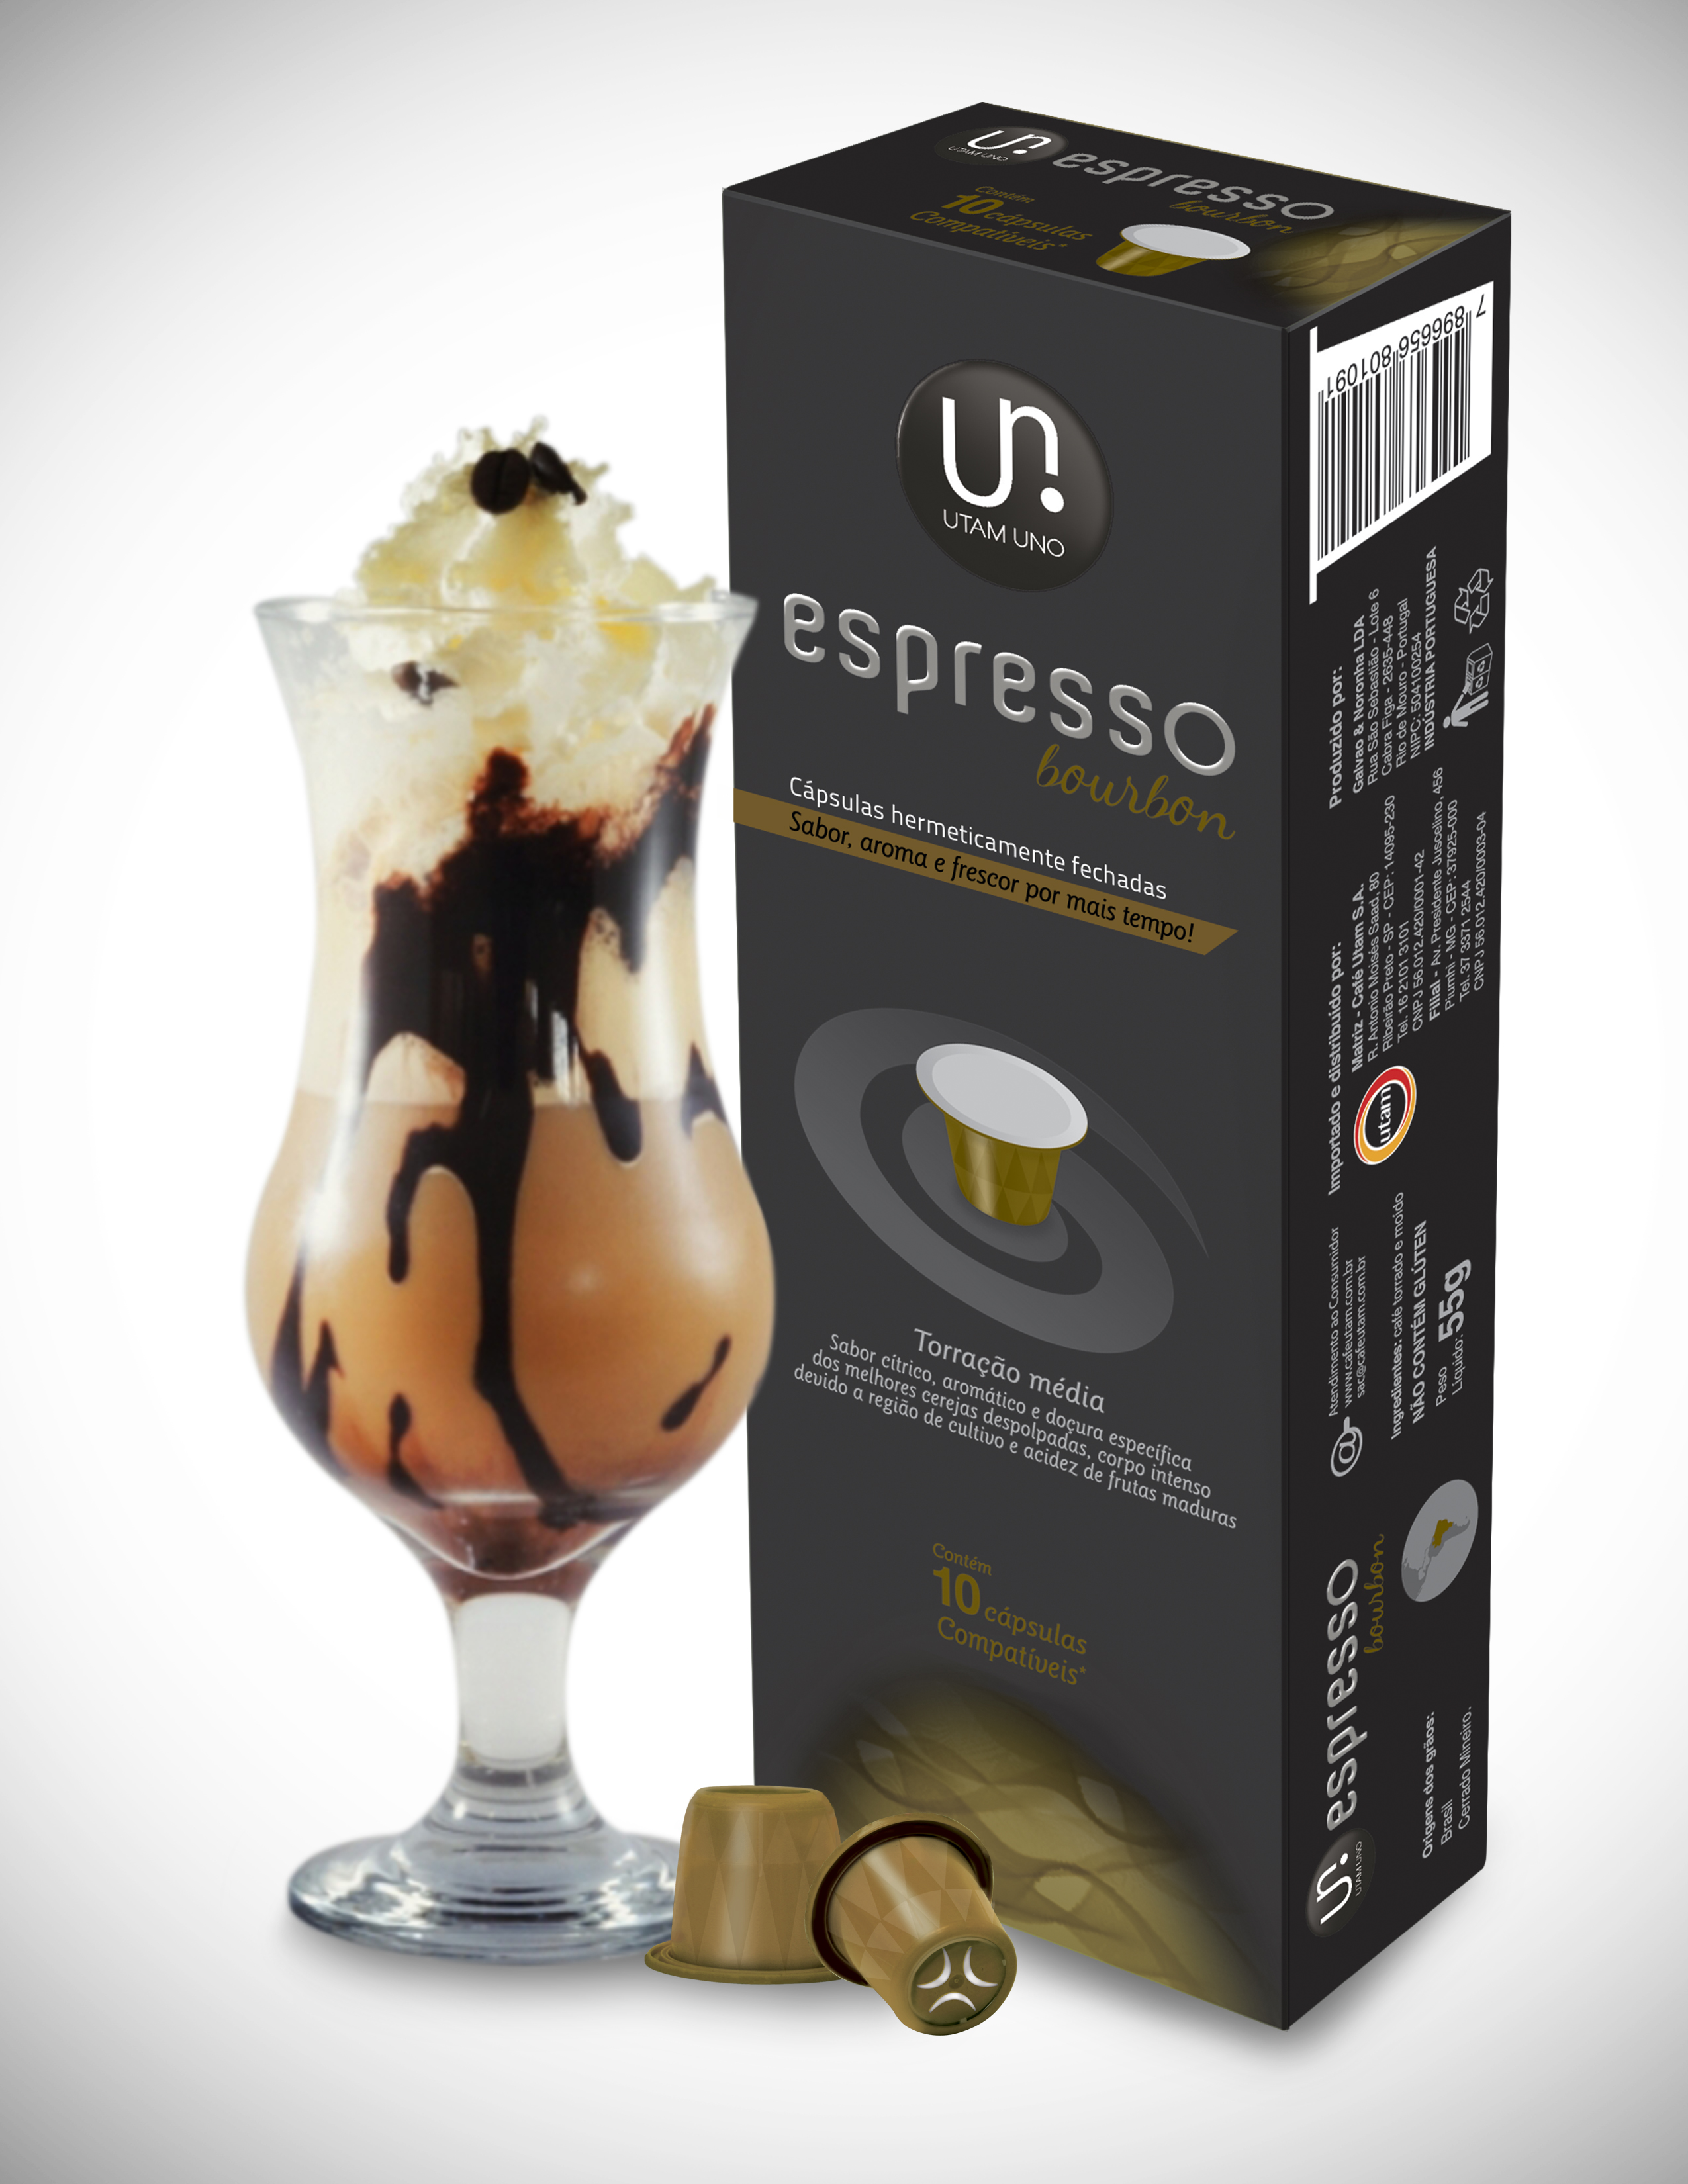 shake-cappuccino-utam-uno